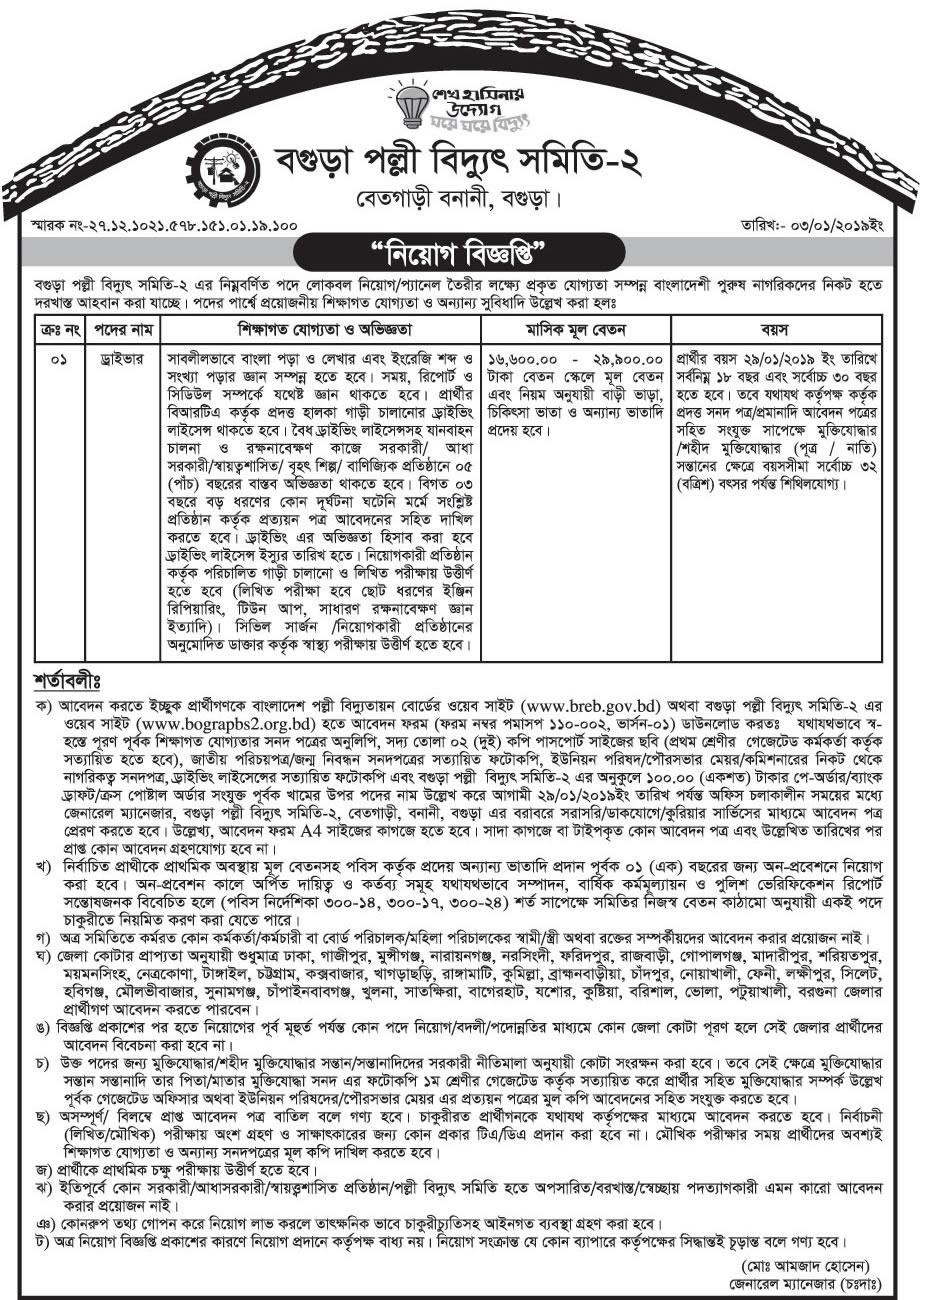 Bogra Palli Bidyut Samity-2 Driver Job Circular 2019